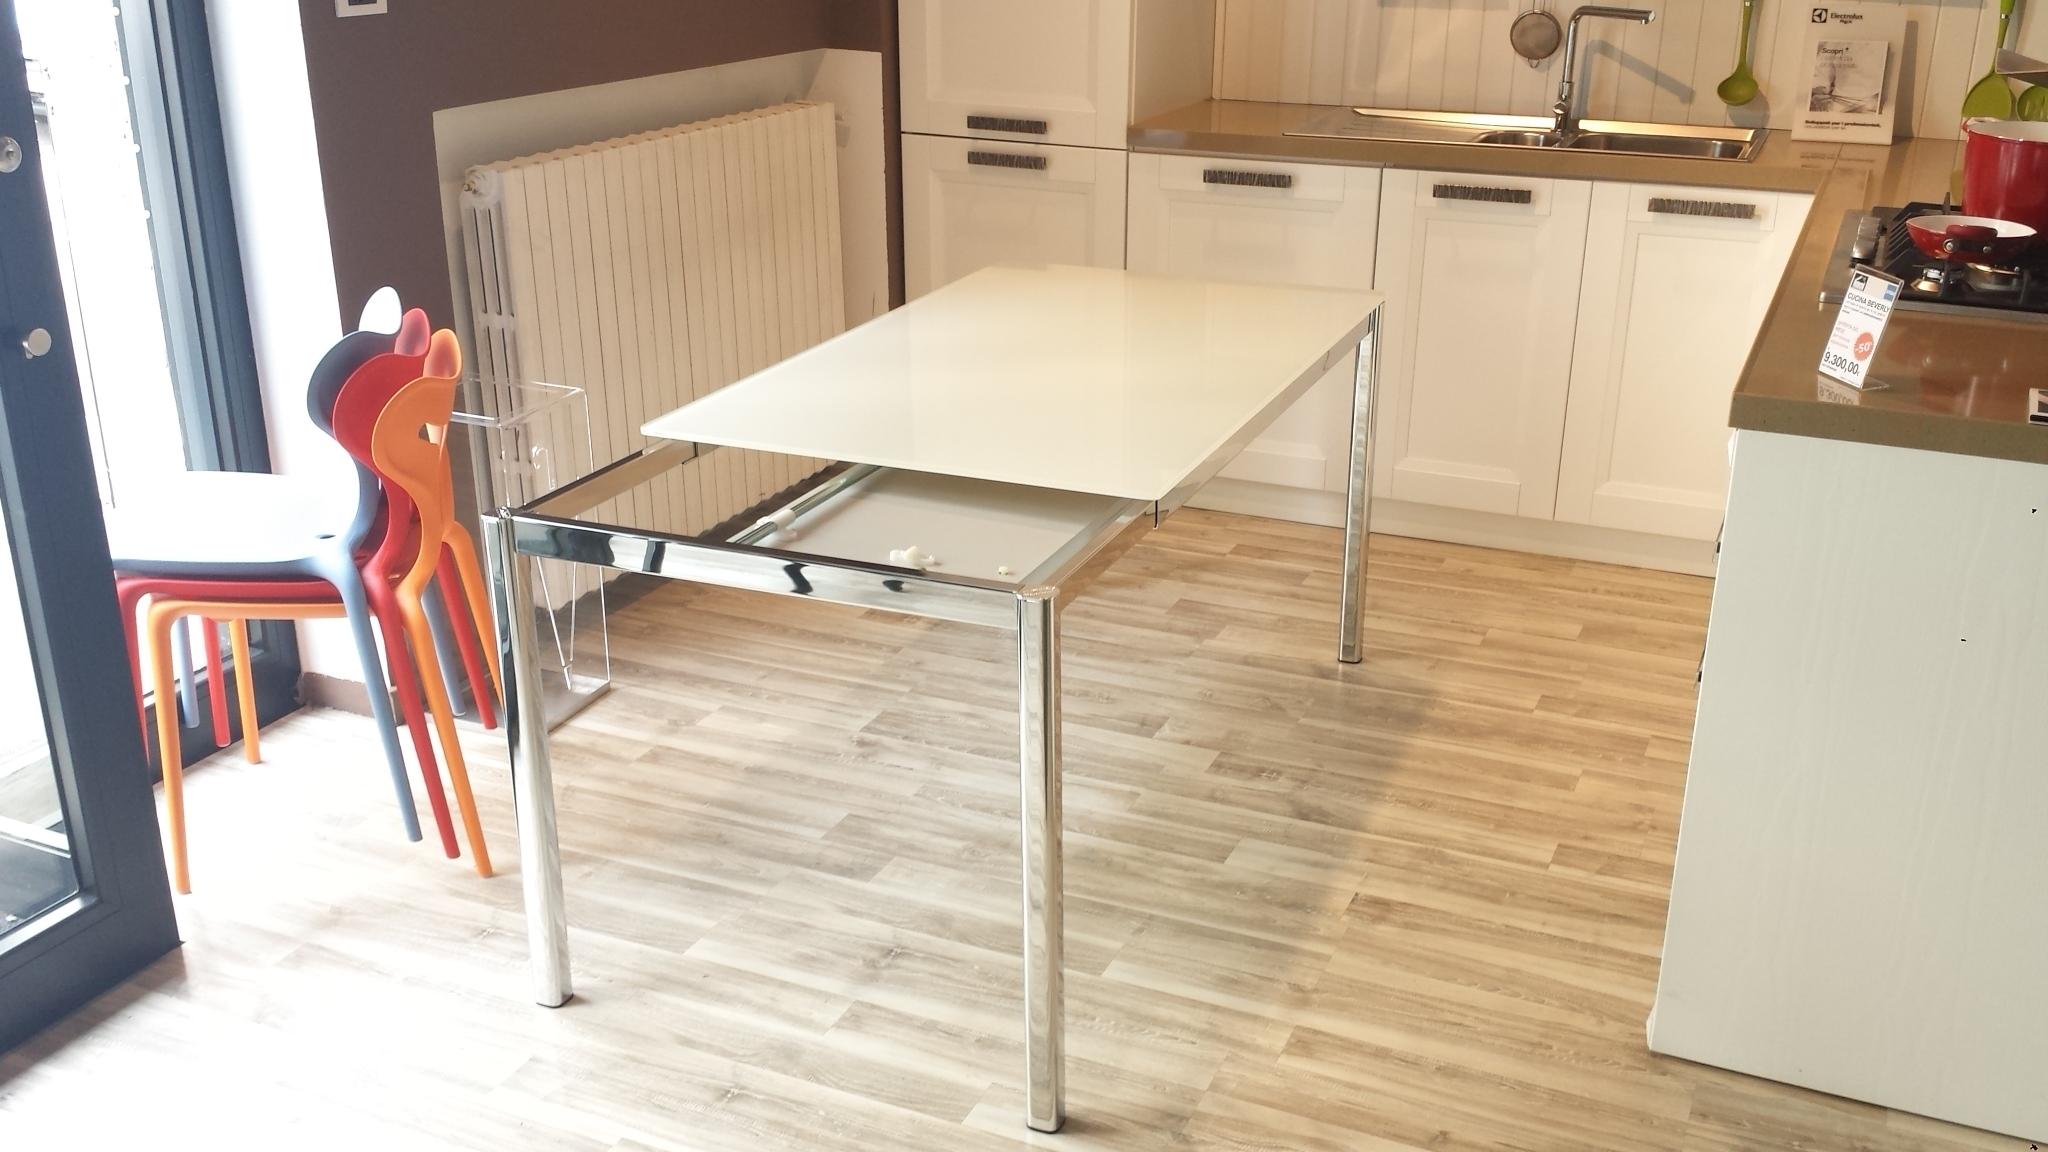 Tavoli Alti Da Cucina Ikea: Sedie cucina arancioni dalani se da e ...